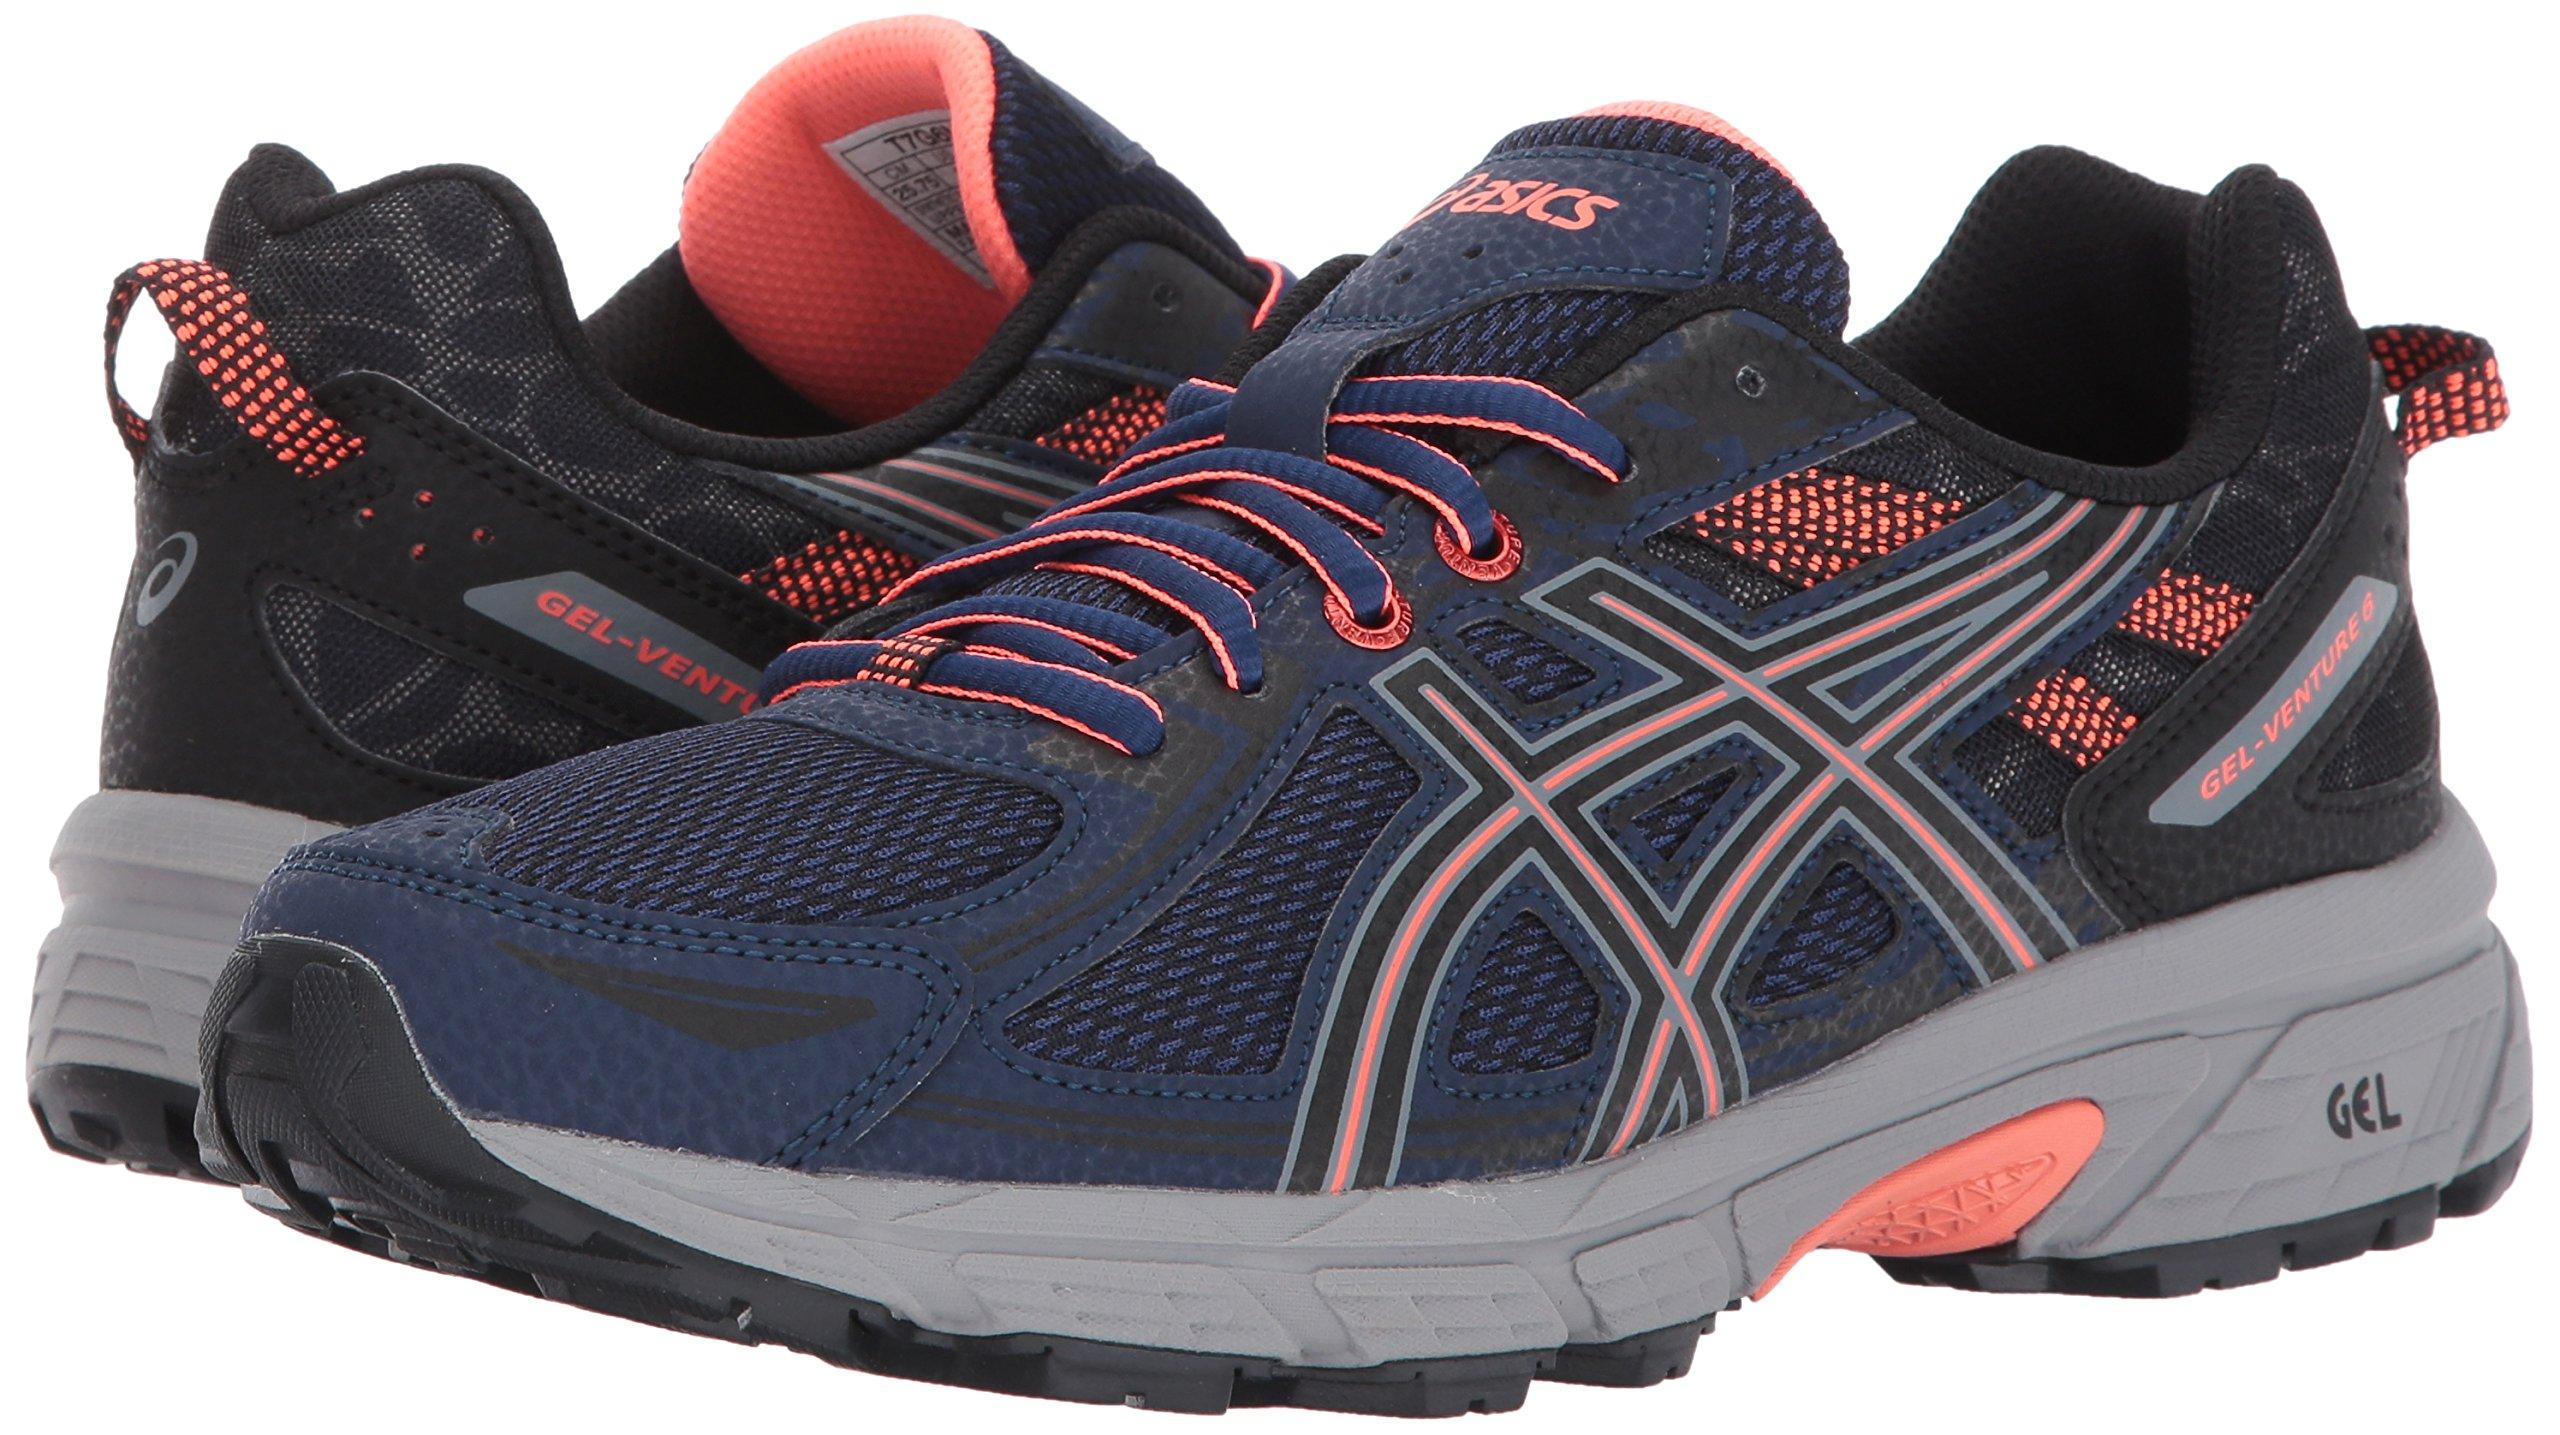 ASICS Women's Gel-Venture 6 Running-Shoes,Indigo Blue/Black/Coral,5 Medium US by ASICS (Image #6)